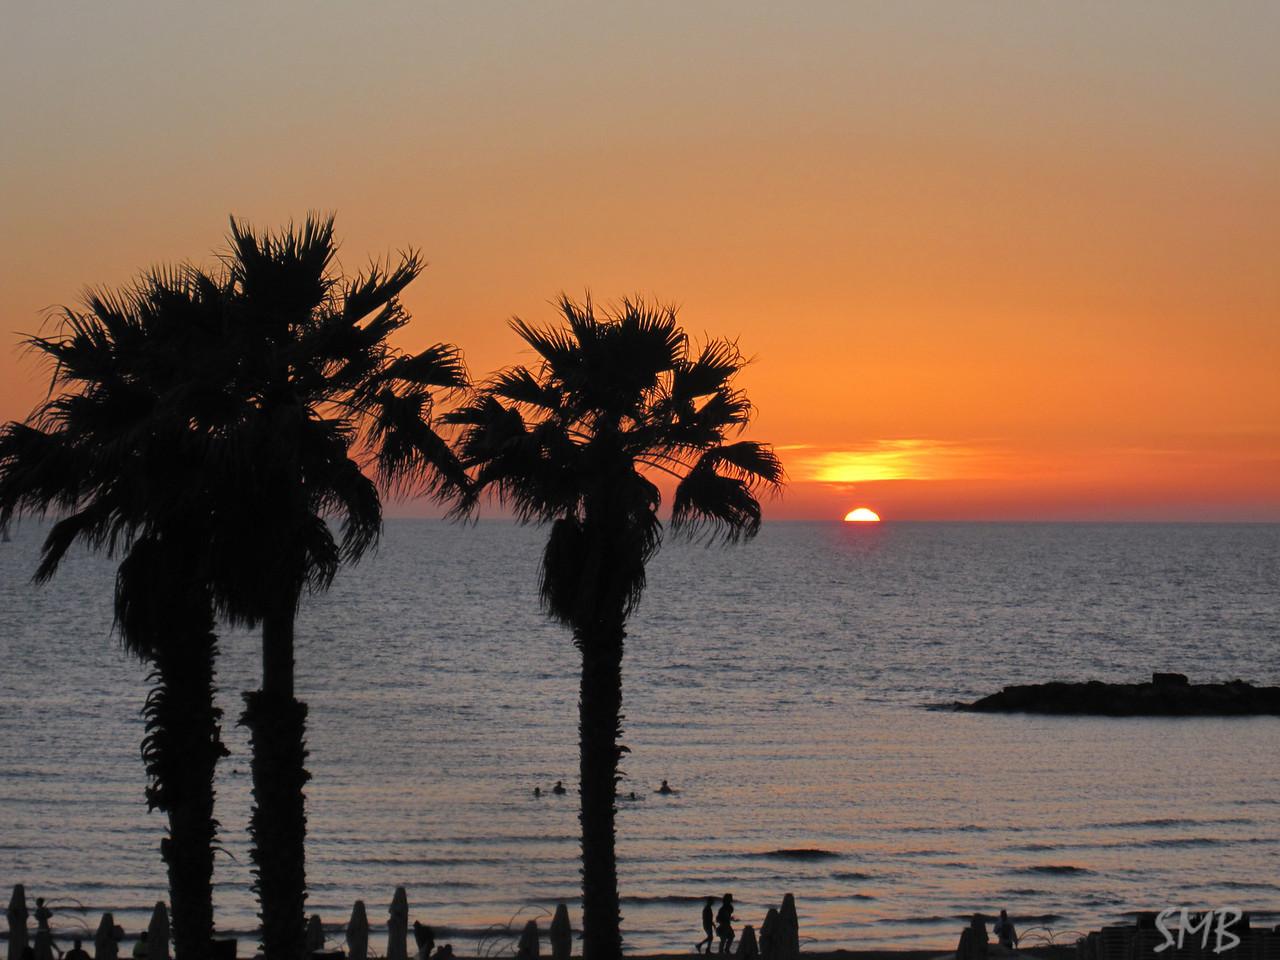 Sunset over the Mediterranean<br /> <br /> Tel Aviv, Israel